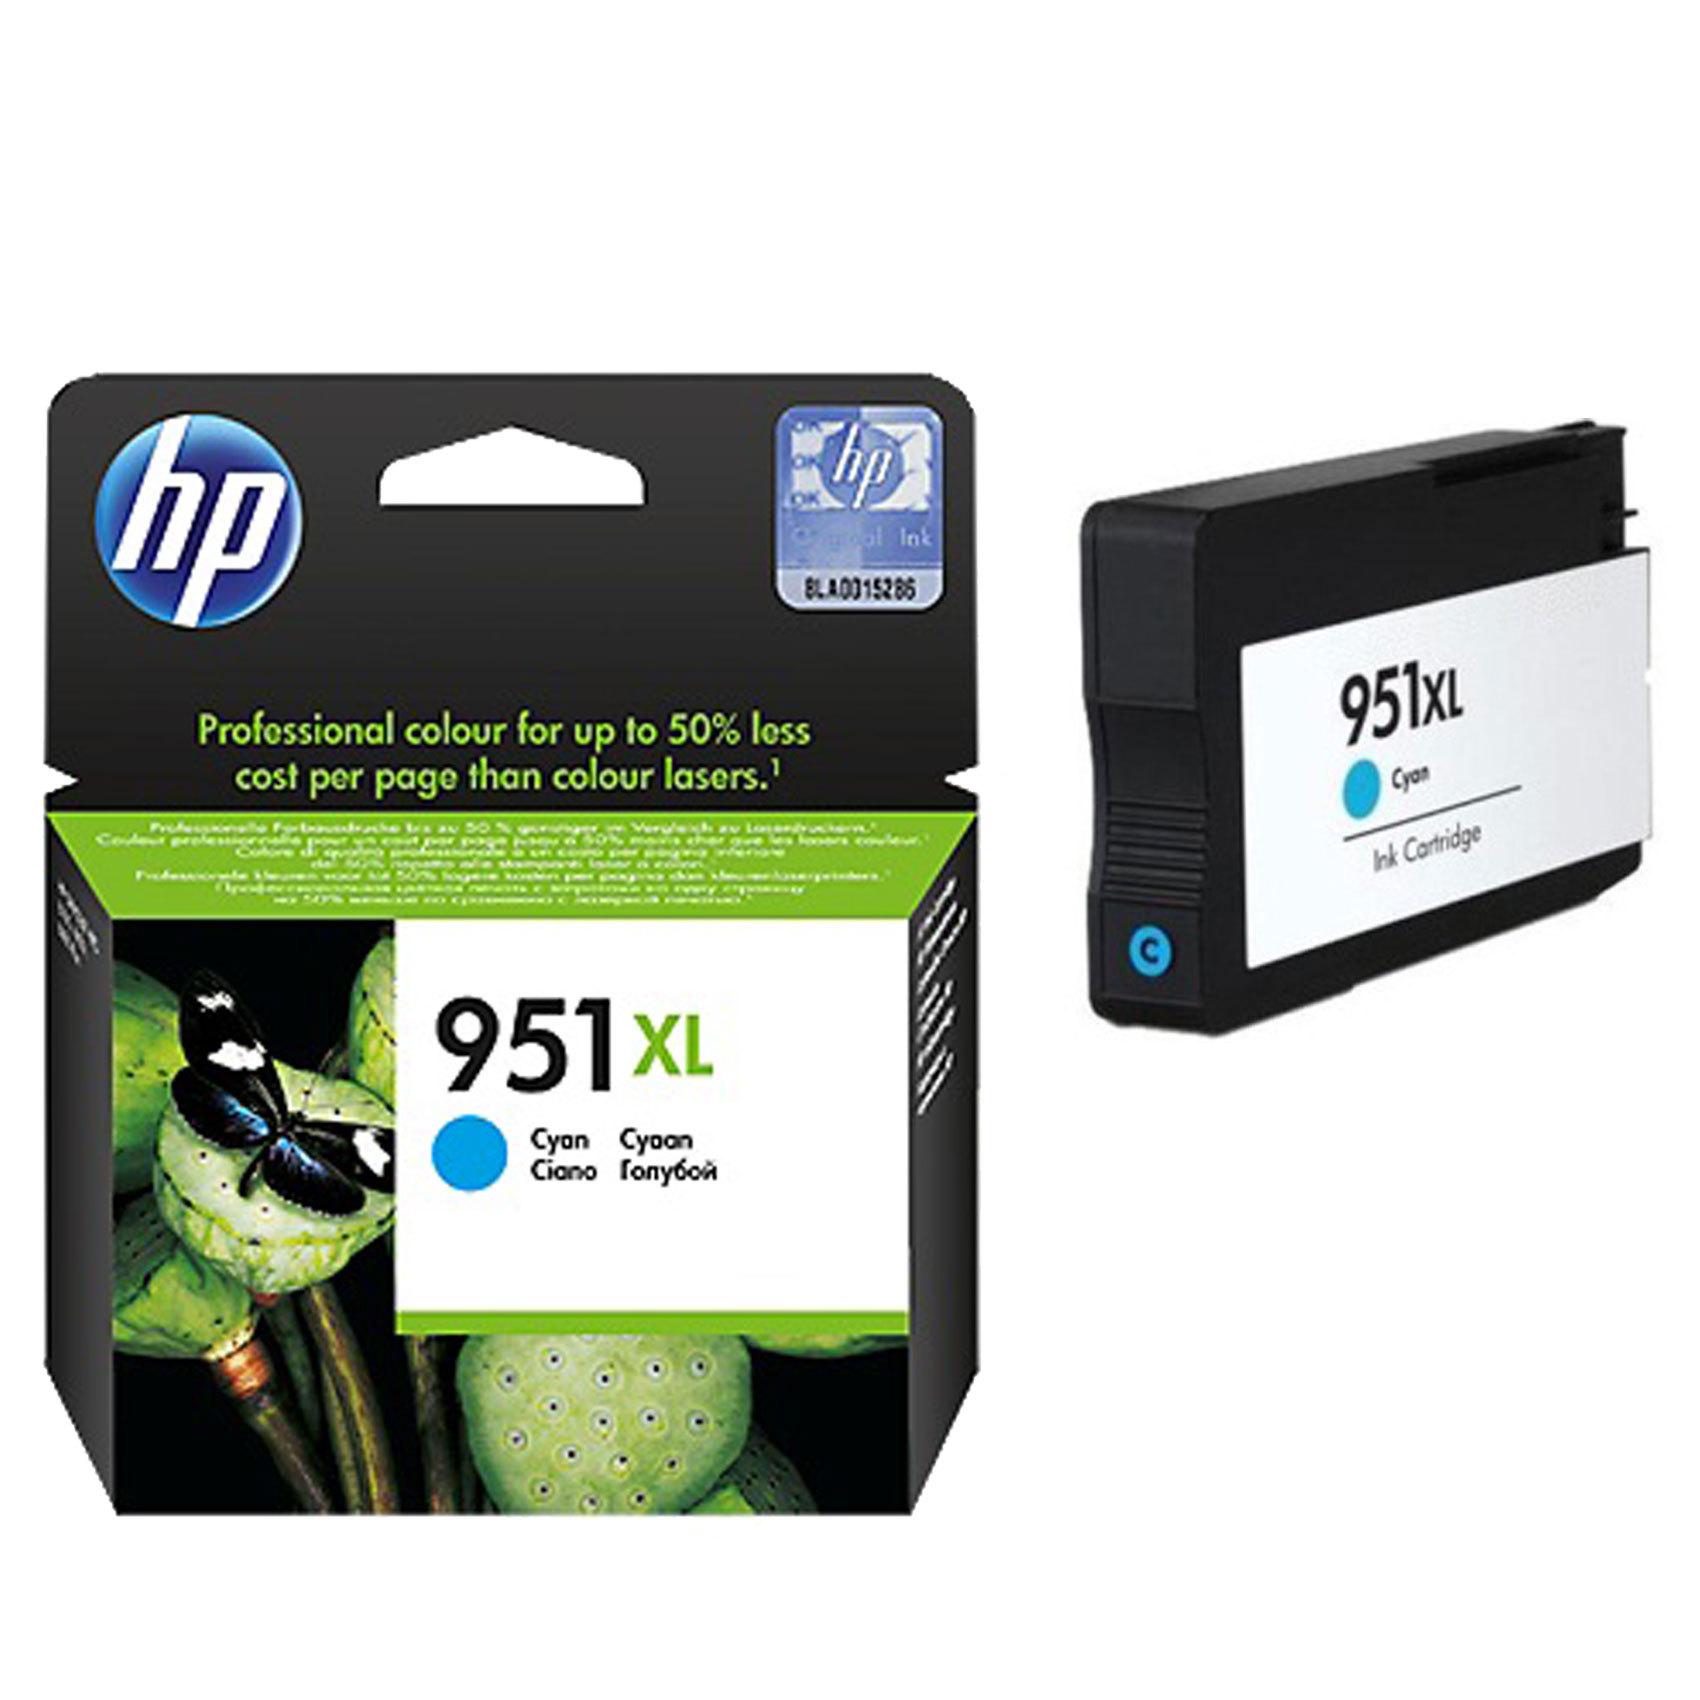 HP CART 951XL CYAN